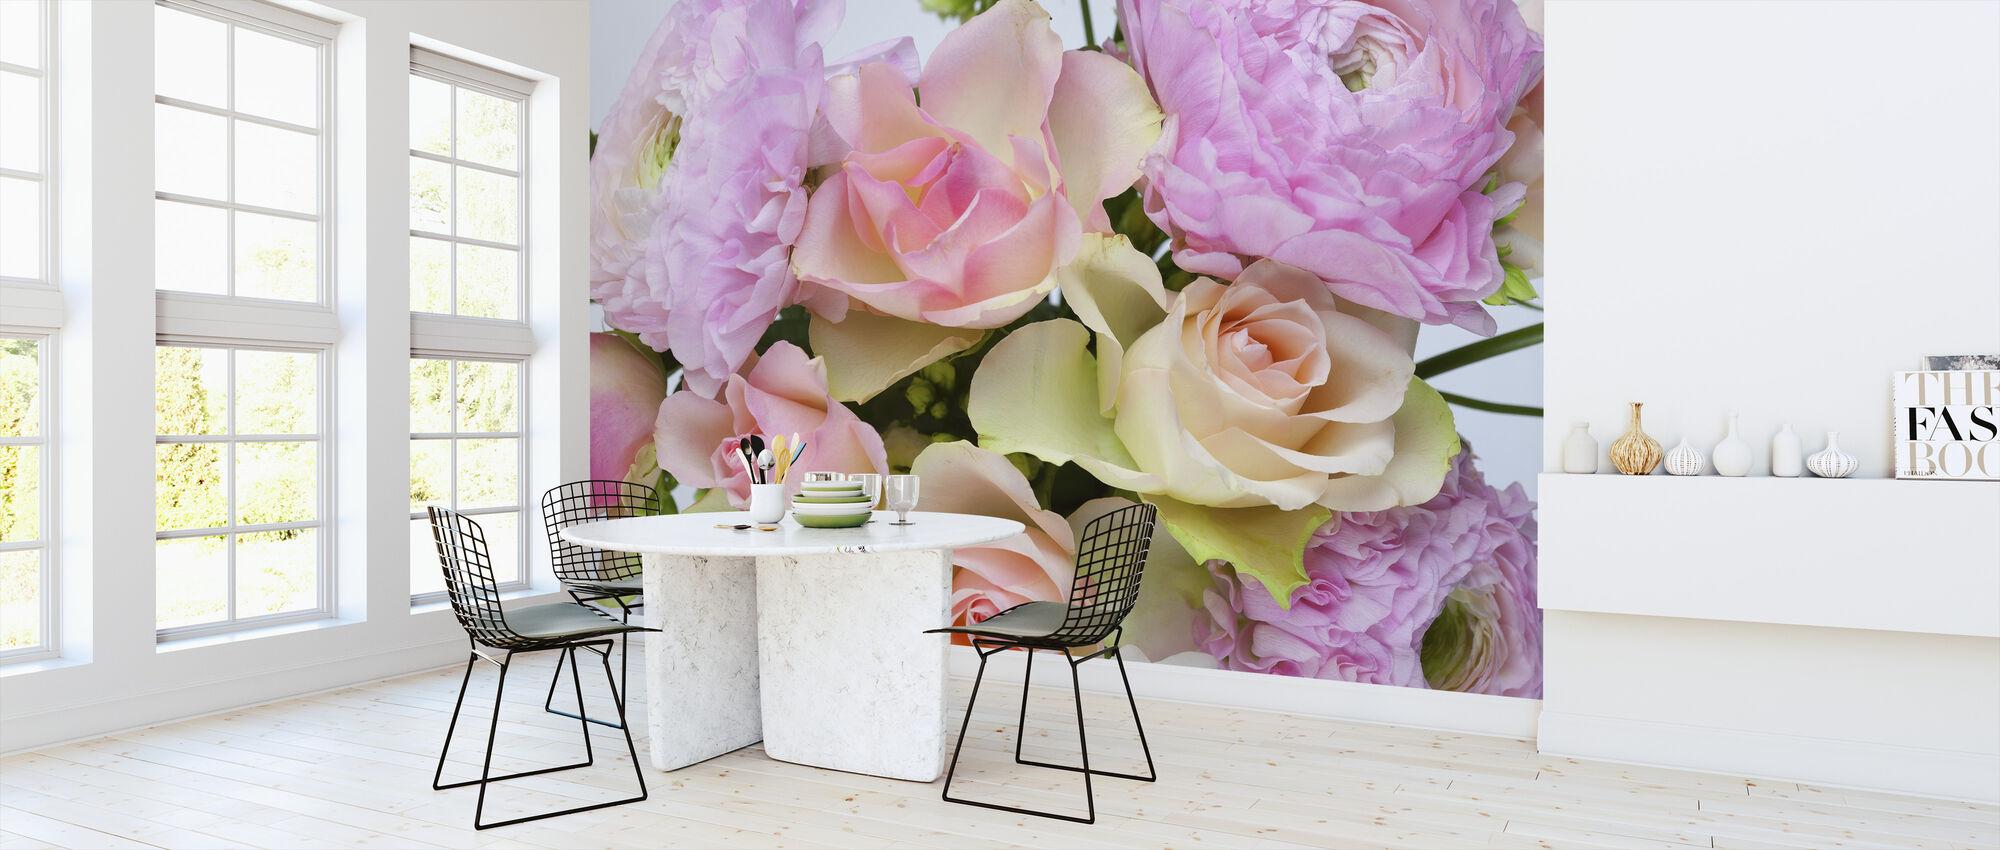 Flowers - Wallpaper - Kitchen